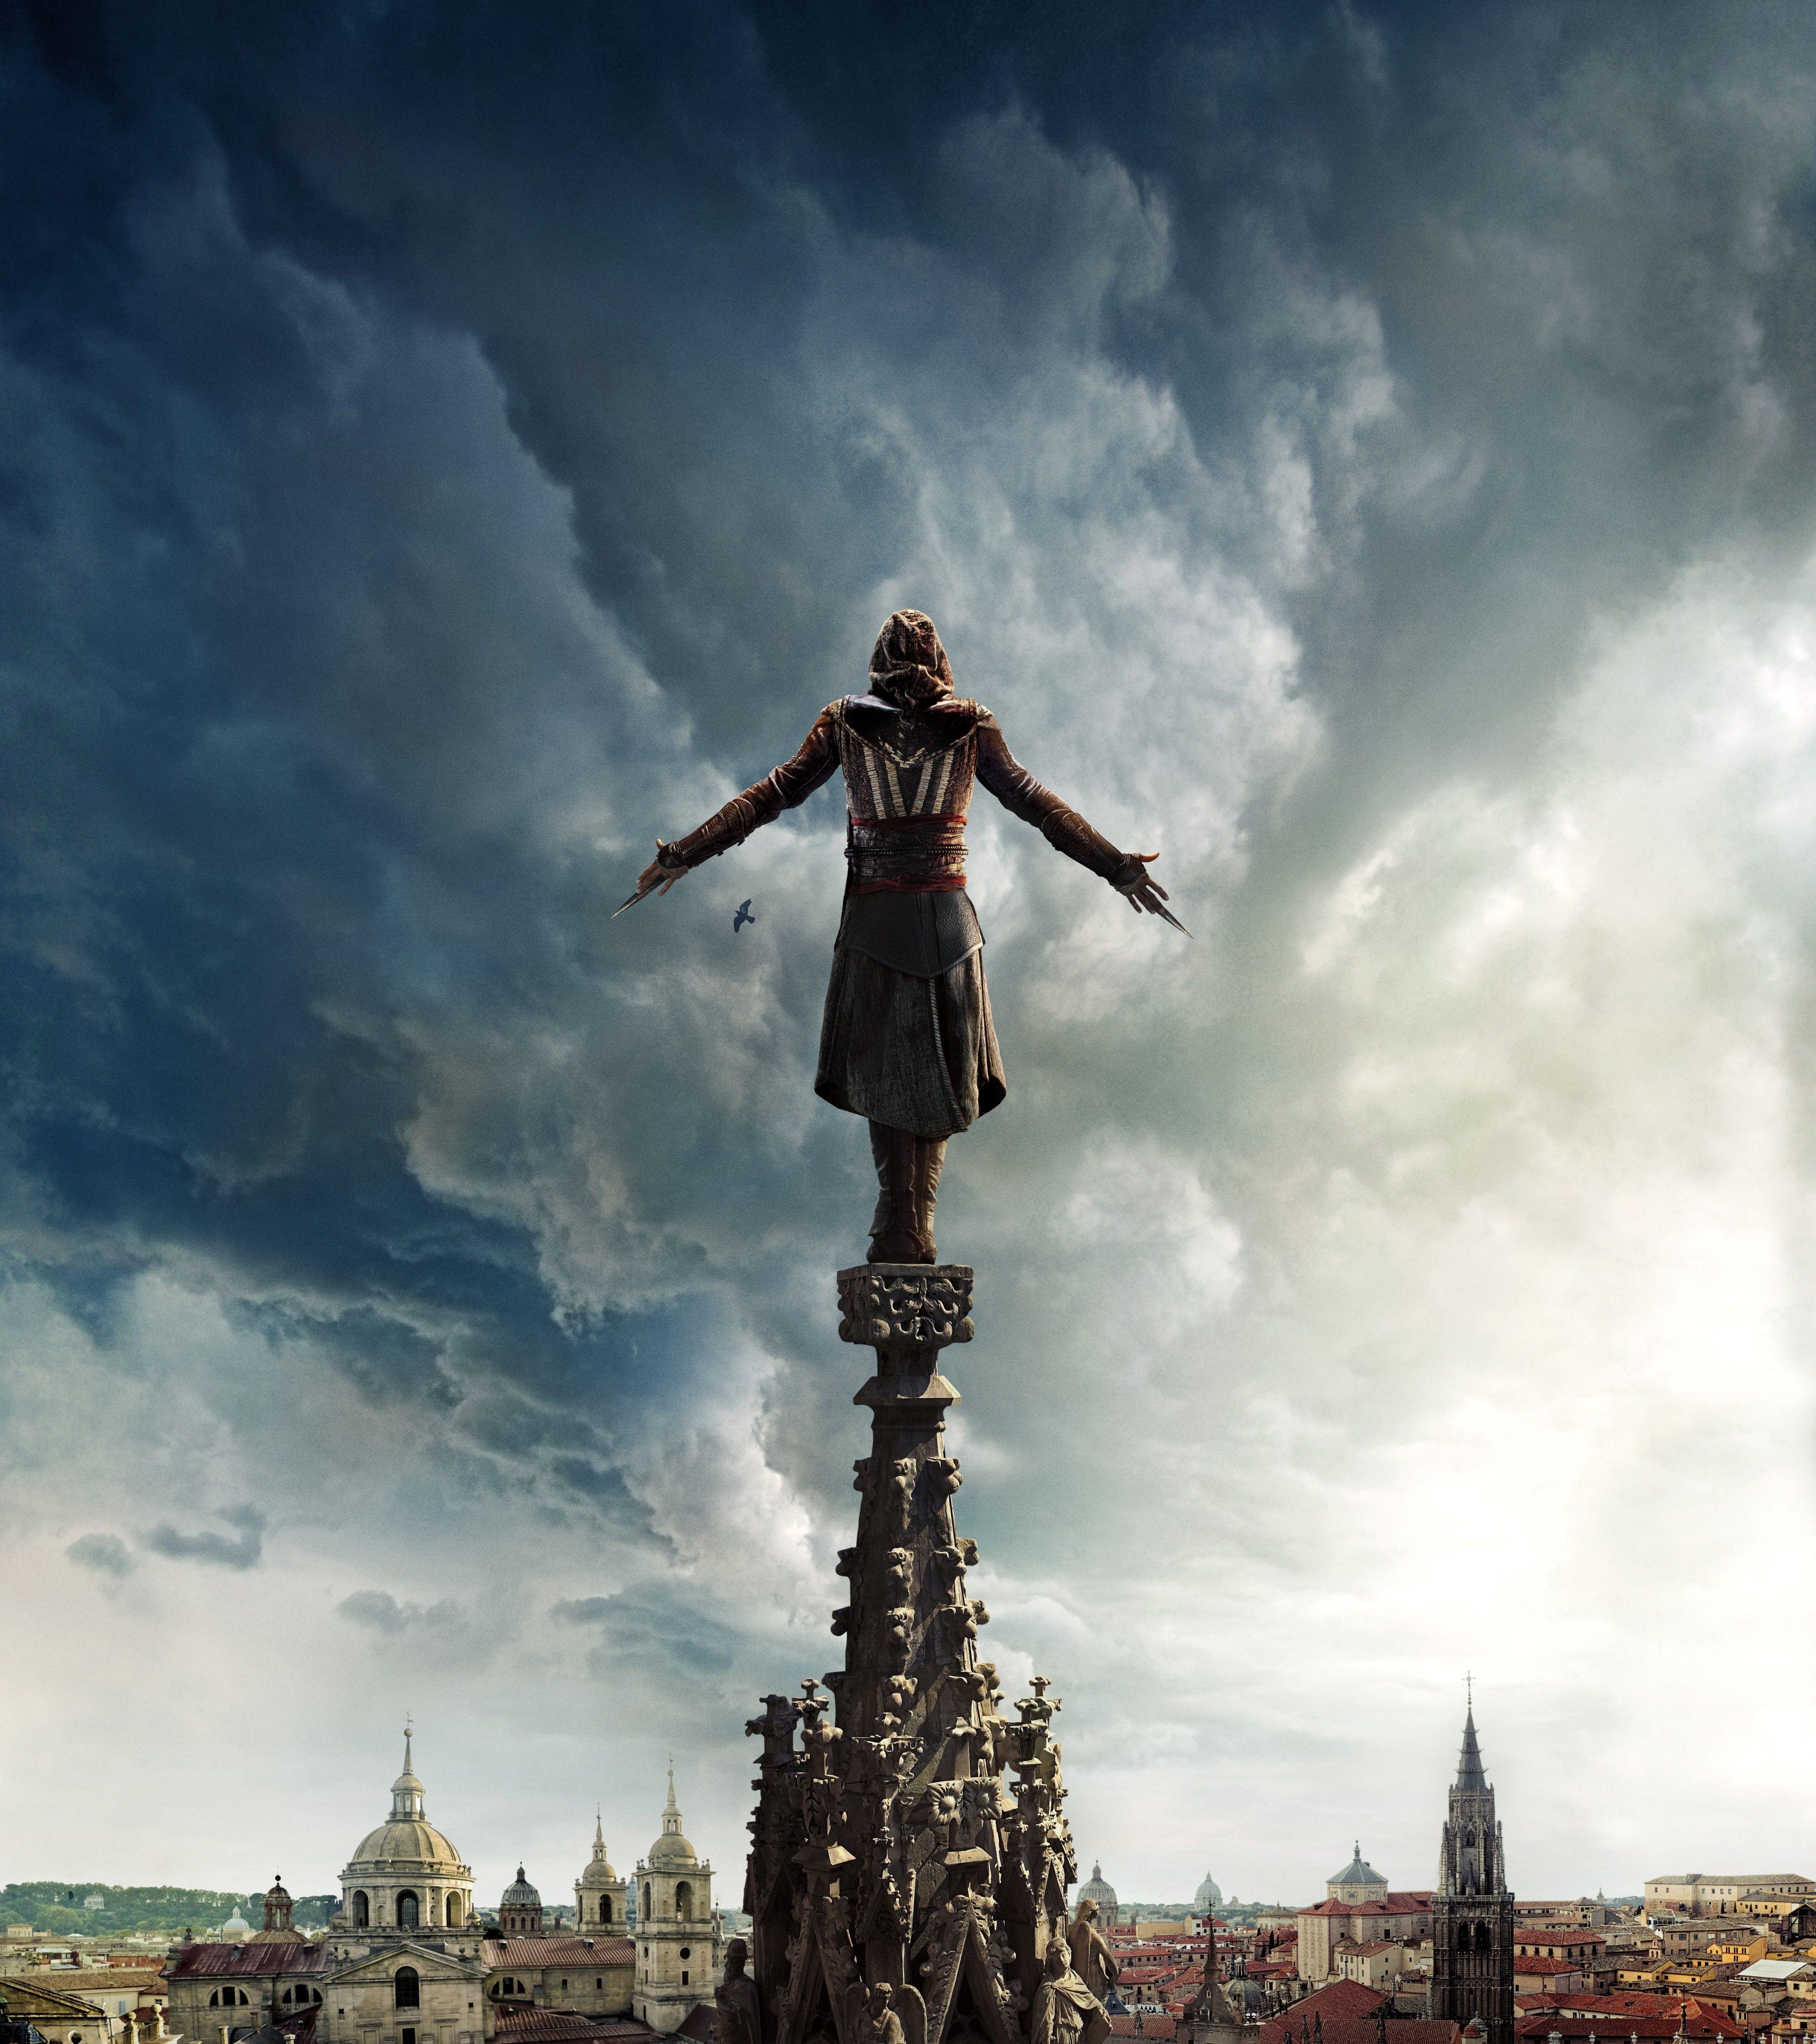 3840x4322 Assassins Creed 4k Wallpaper Desktop Free Ezio